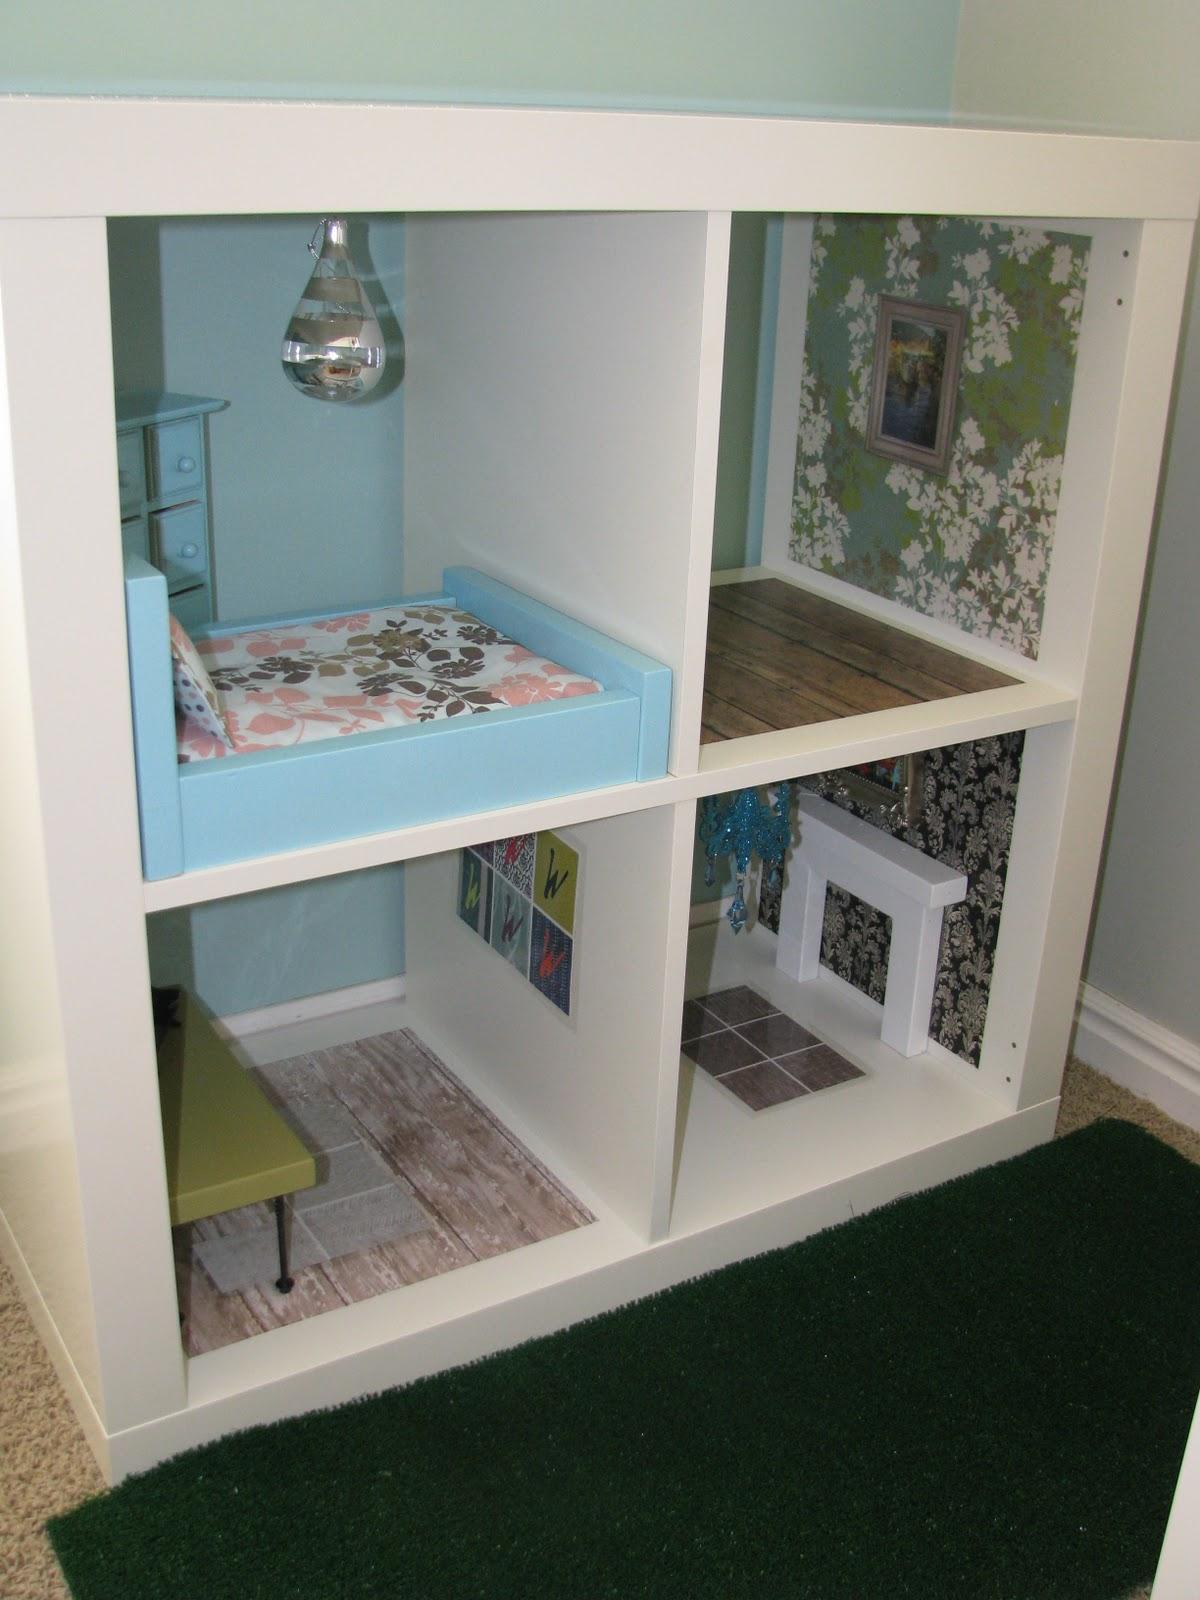 Dollhouse Bookcase Diy: Occasionally Inspired: Bookshelf Barbie House